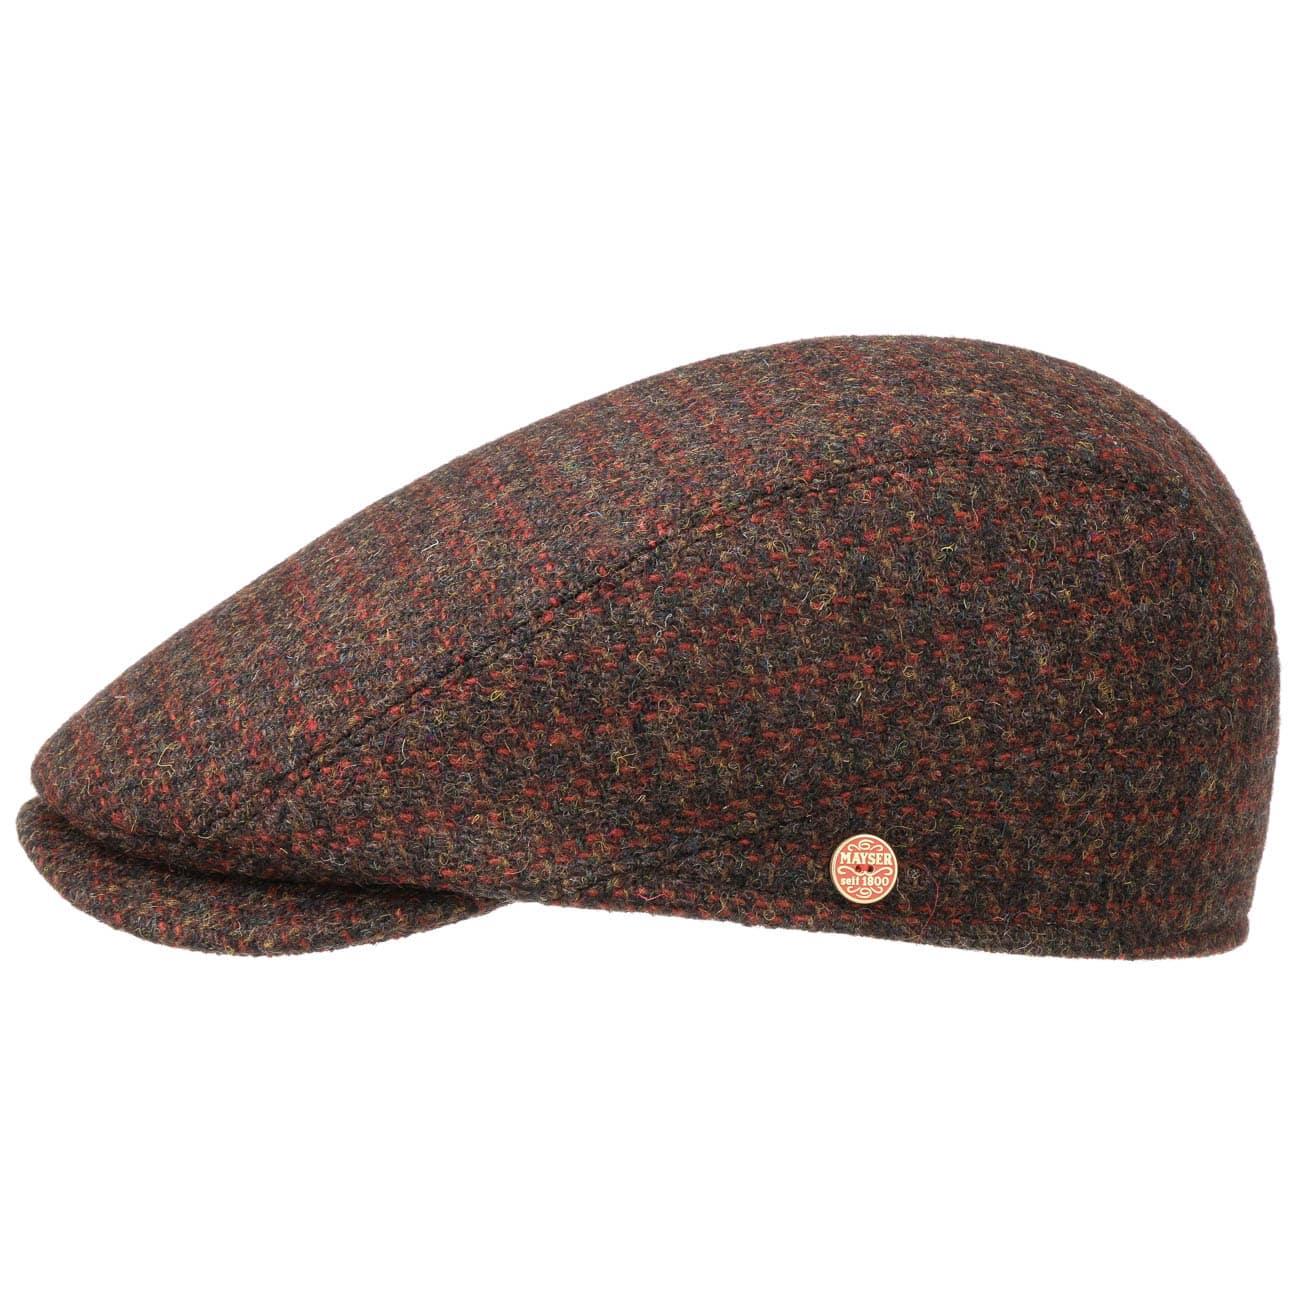 Gorra Harris Tweed Delian by Mayser  gorra de lana